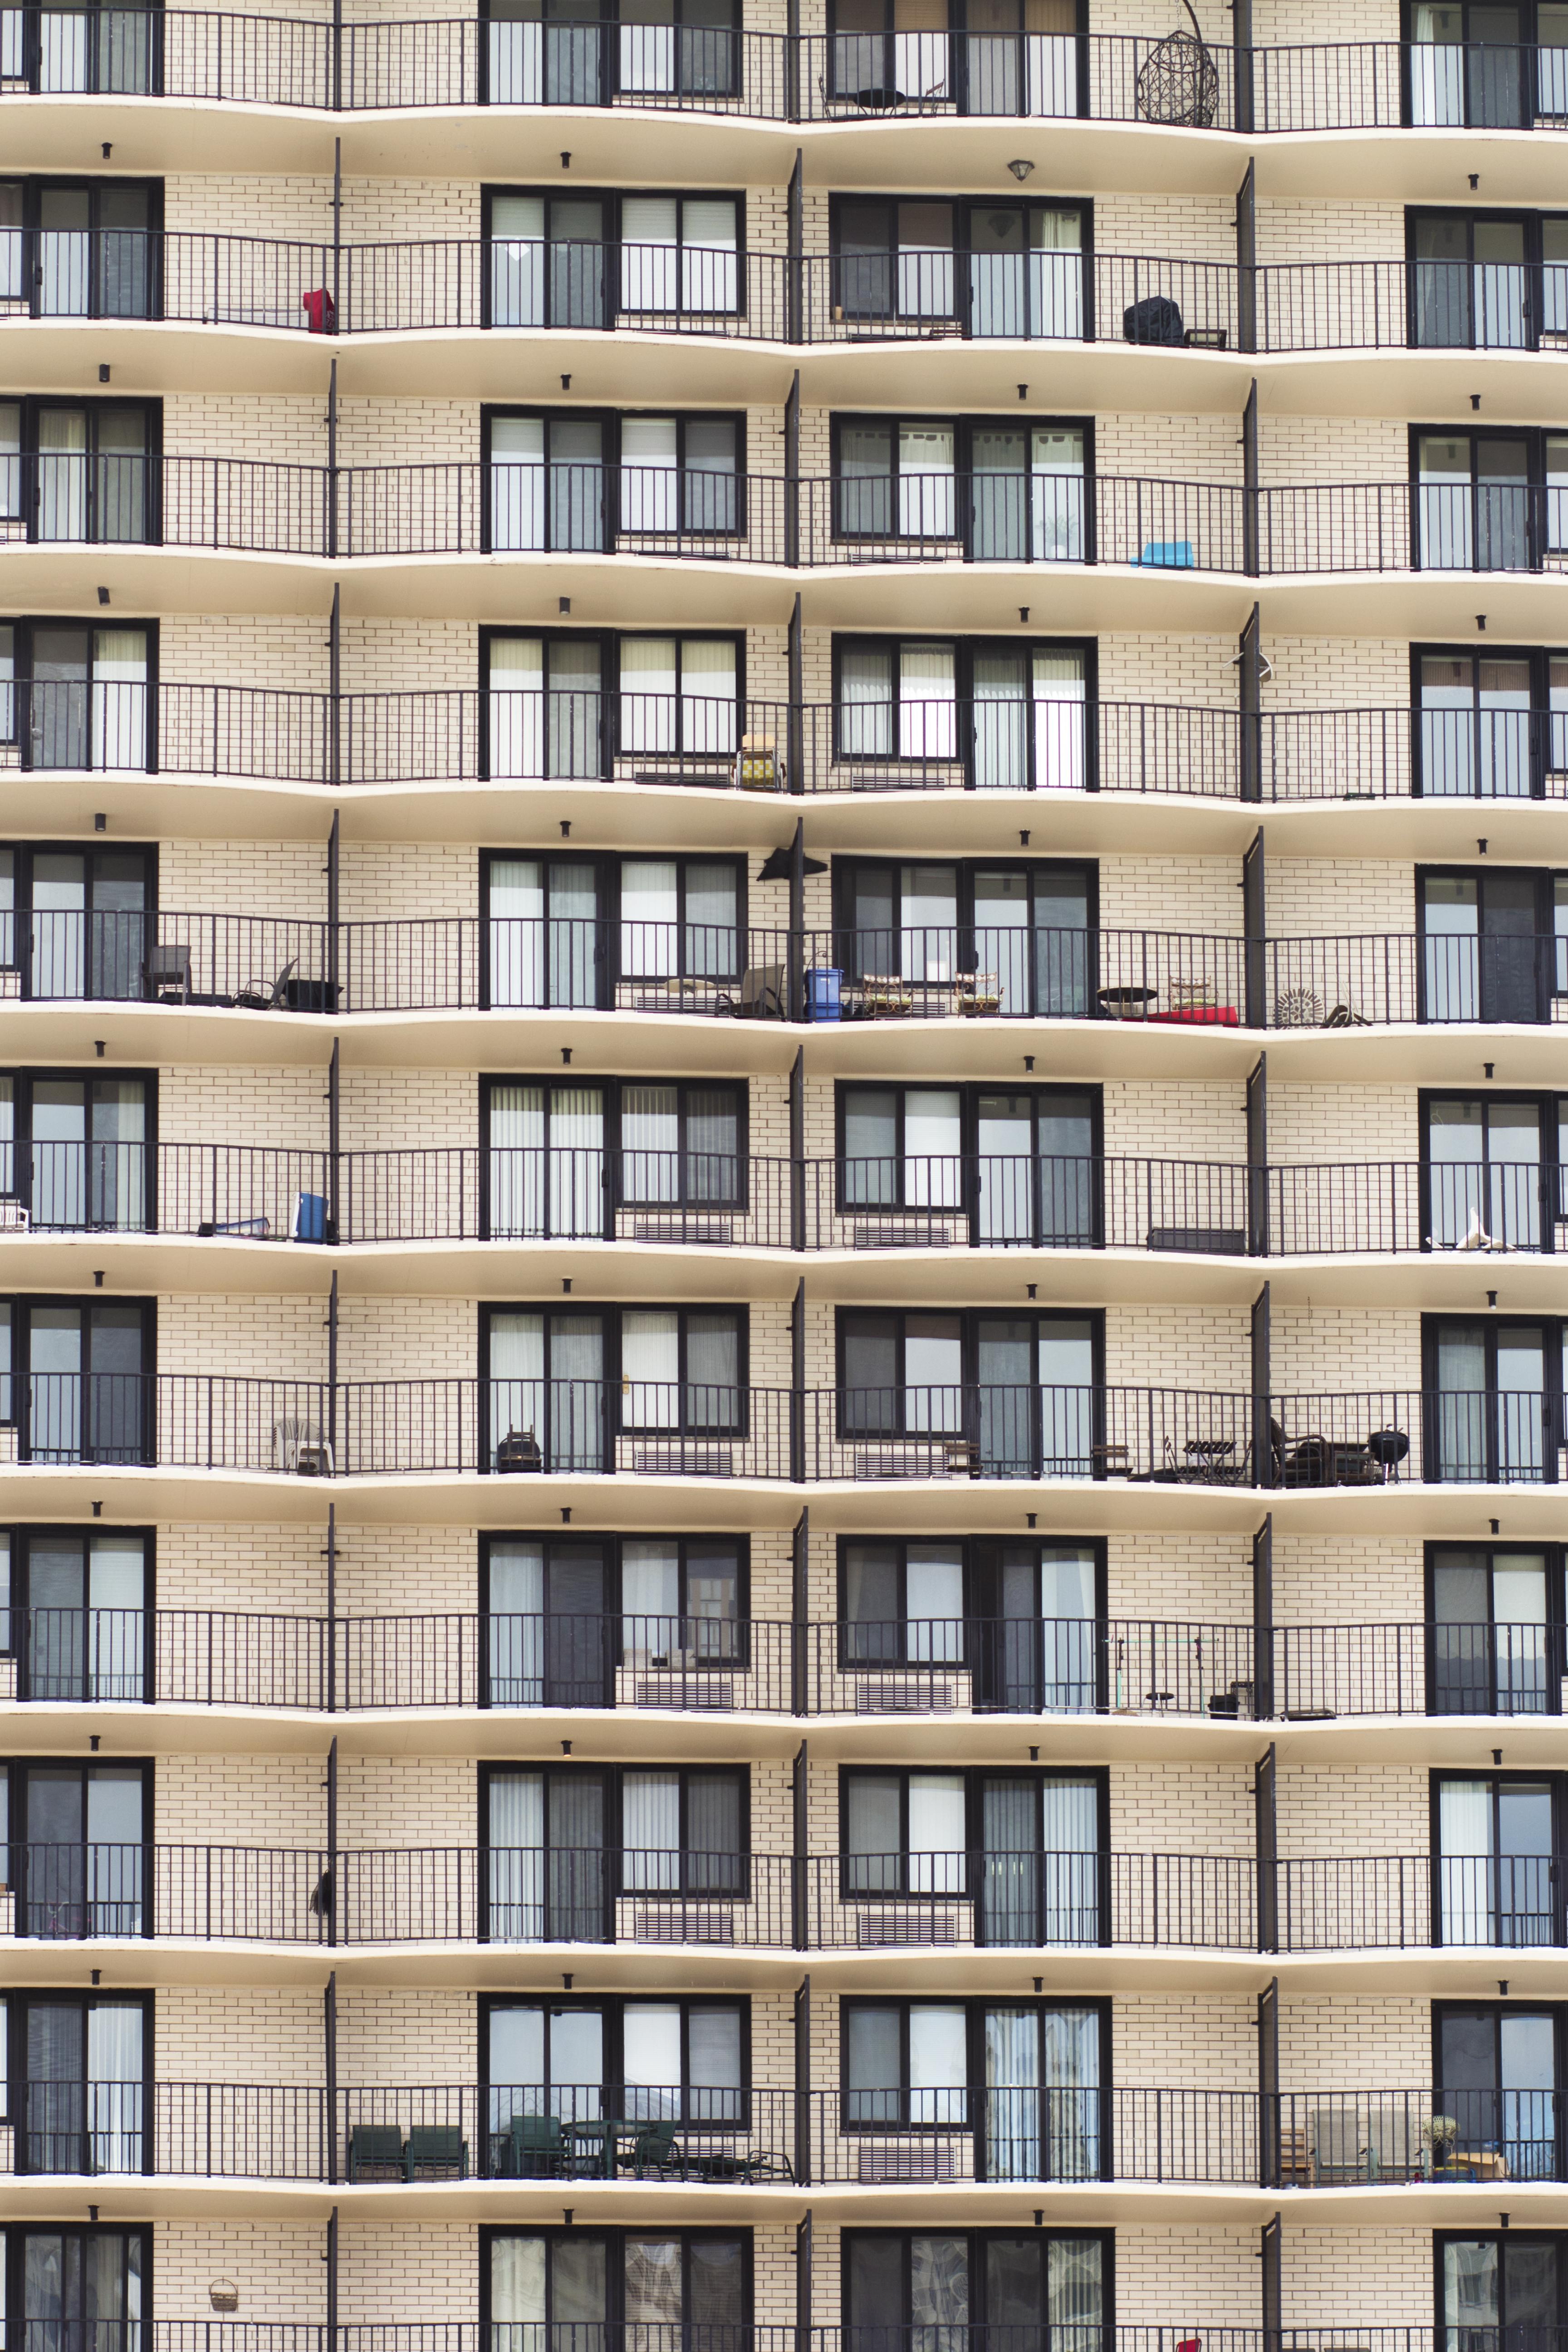 Eileen_Ko_Travel_Apartment_Windows_Balcony_Chairs